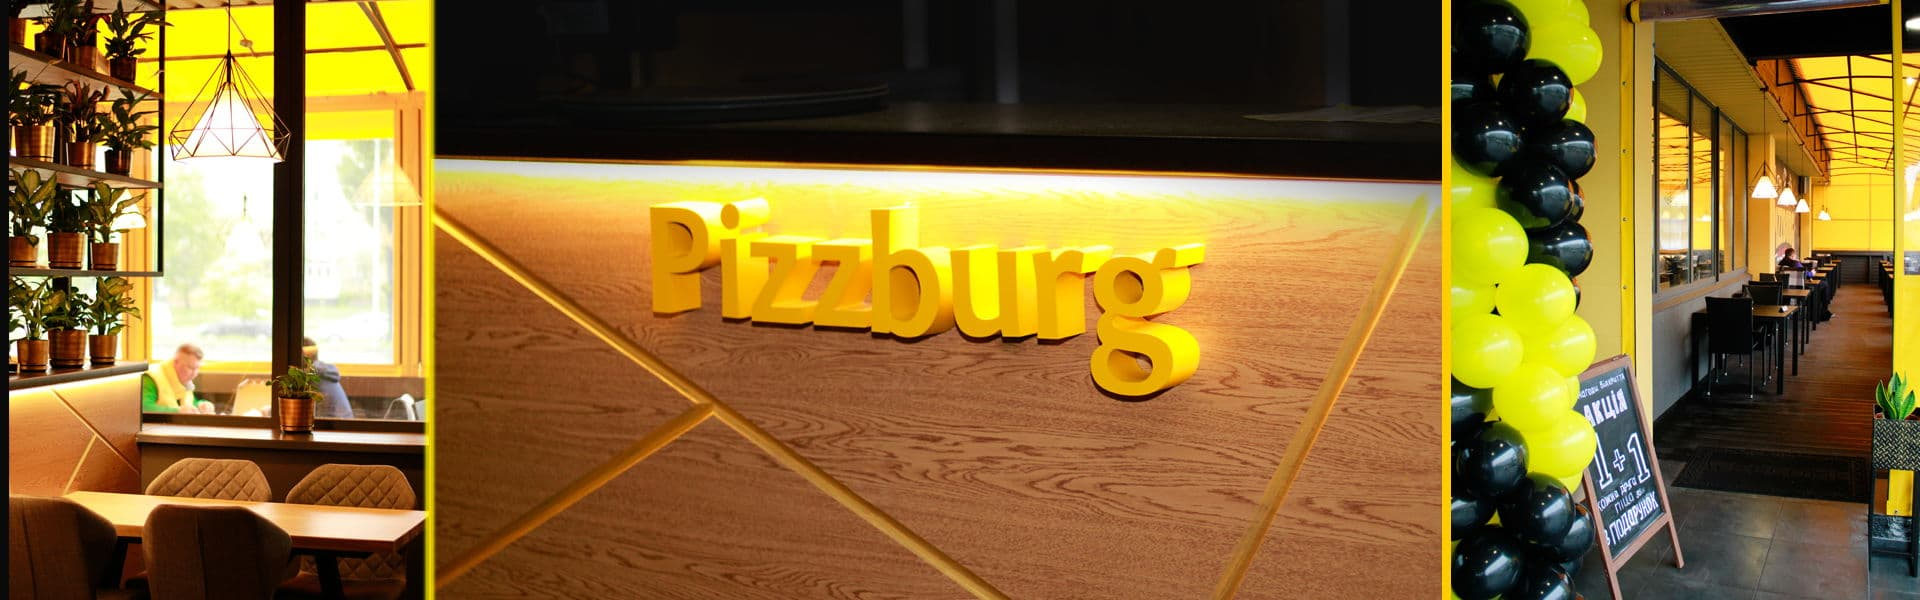 Фото - Pizzburg - любимая пицца на Харьковском  - Пиццбург